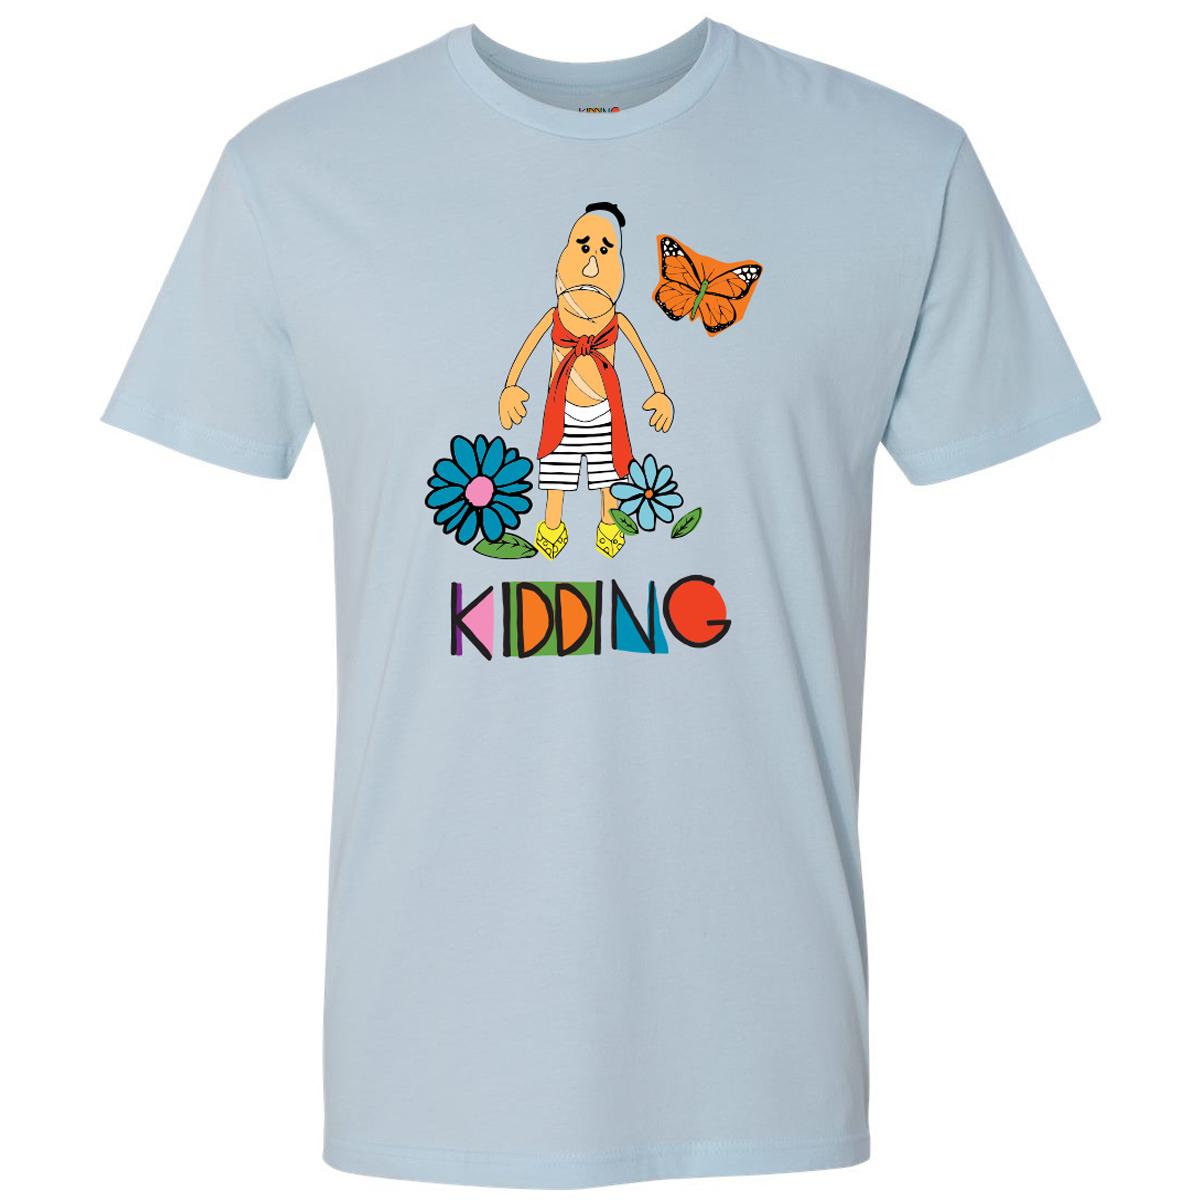 Kidding Ennui Le Triste T-Shirt